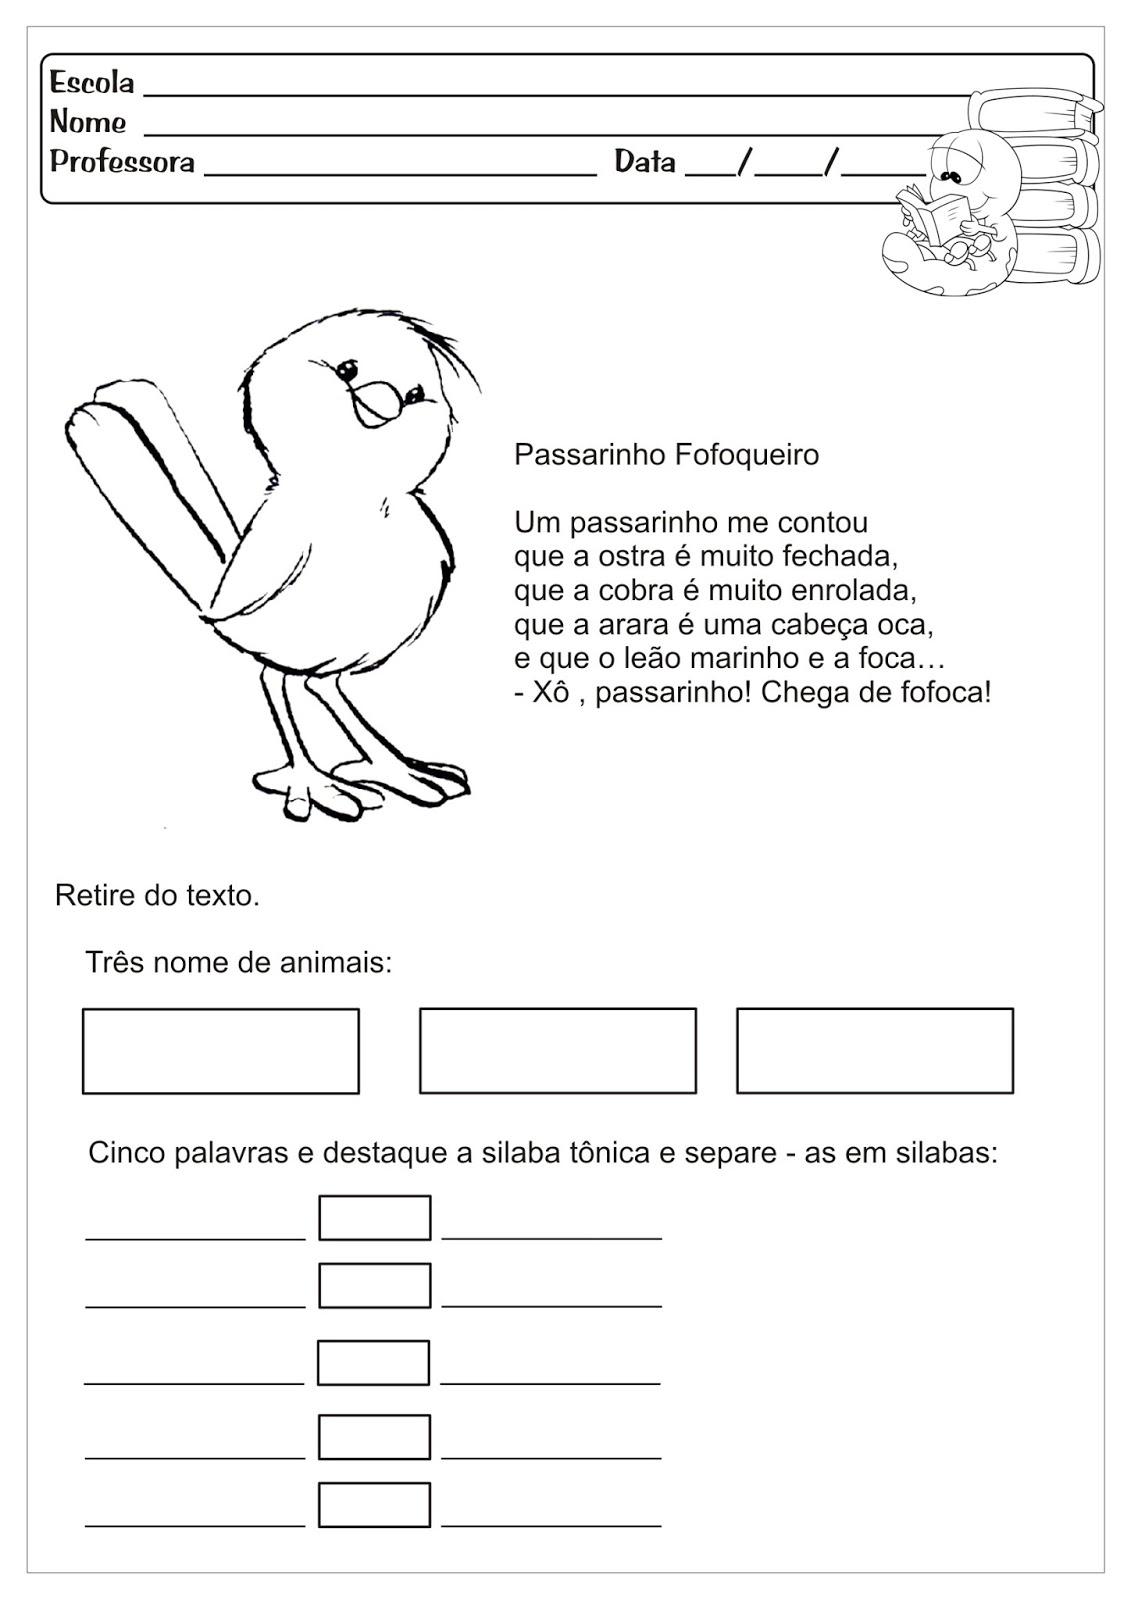 Atividades Educativas Sílabas Tônicas Língua Portuguesa para Ensino Fundamental